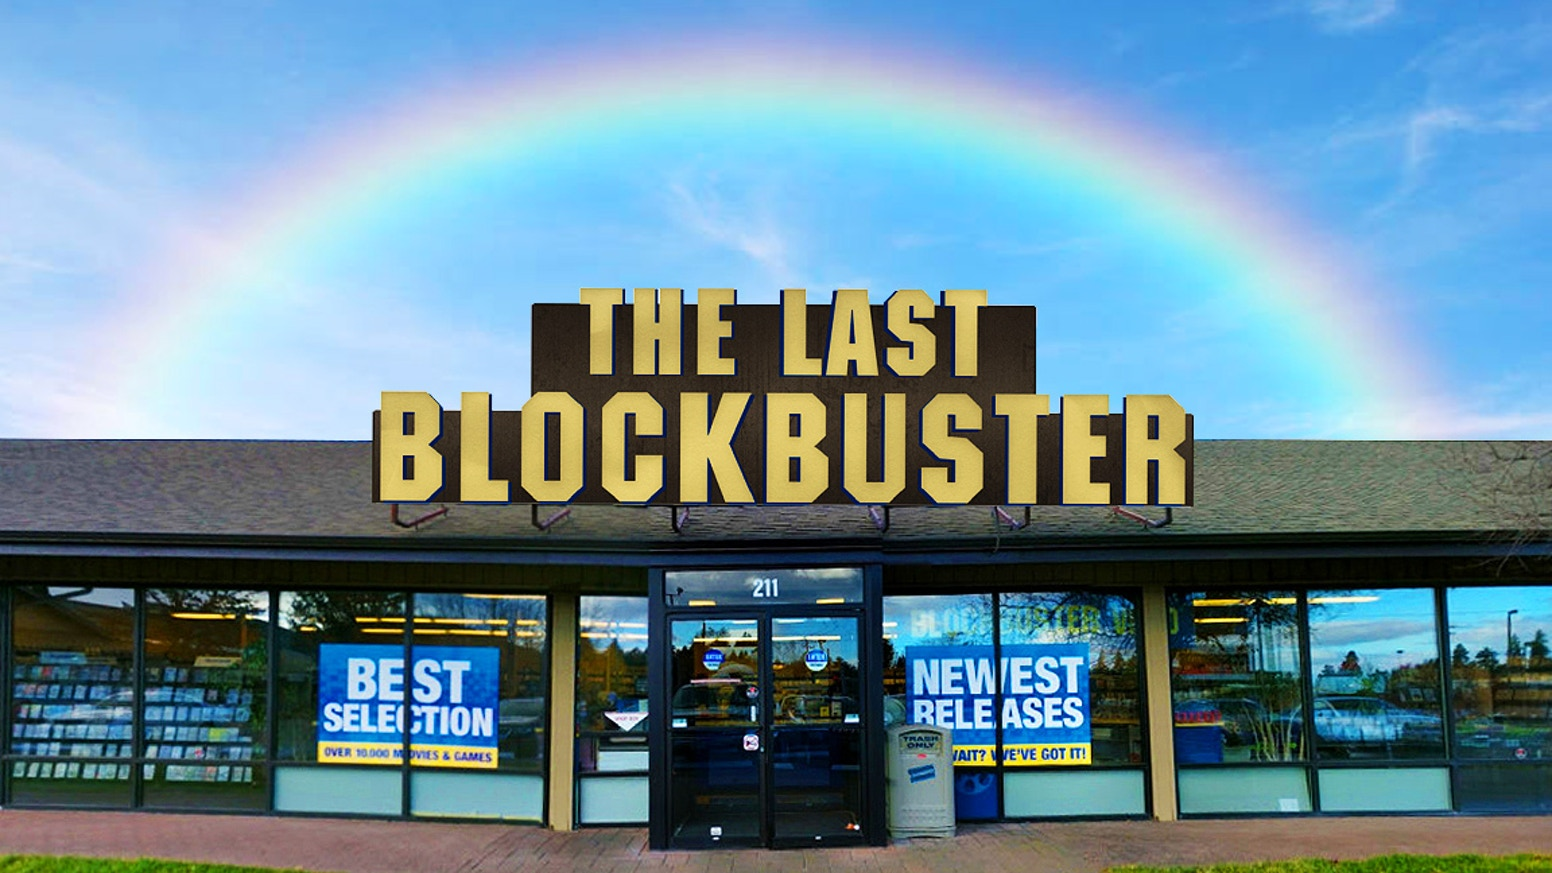 The Last Blockbuster by Popmotion Pictures — Kickstarter